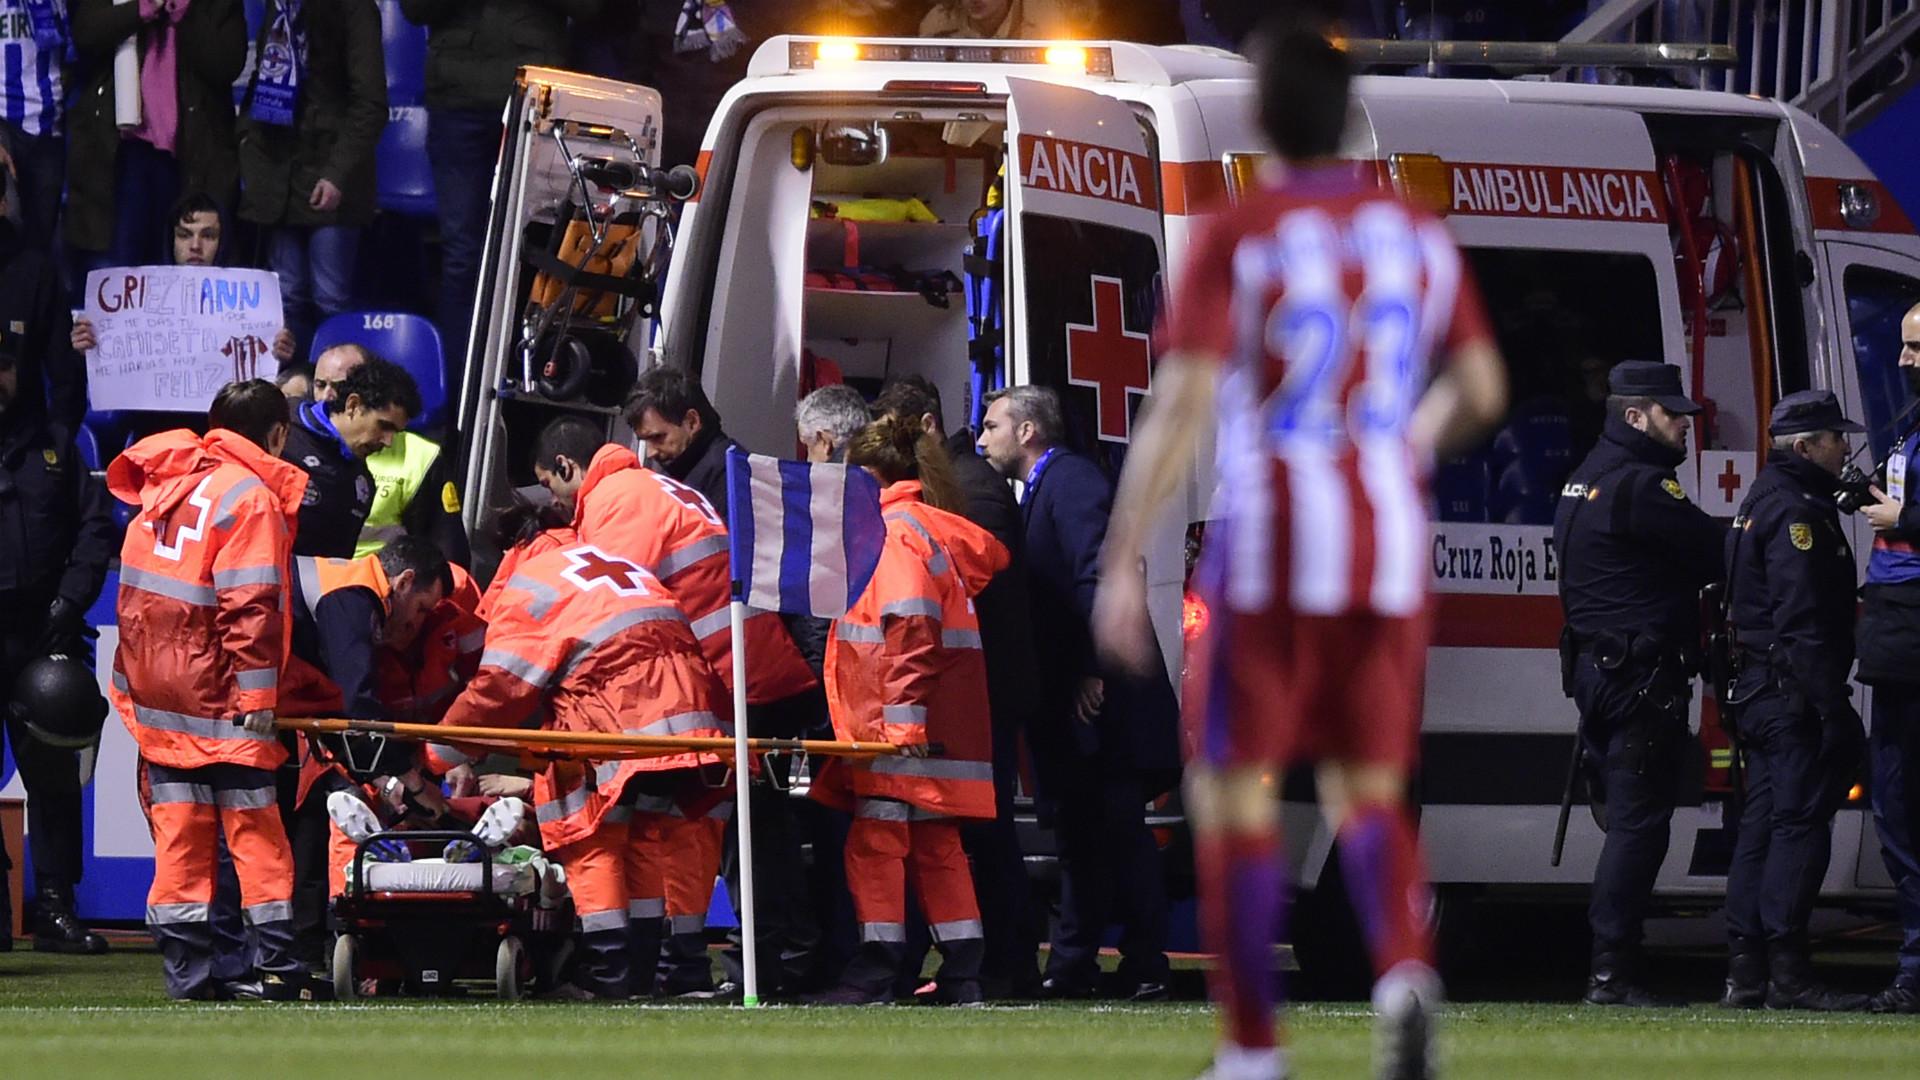 Fernando Torres Ambulance Atletico Madrid 2017